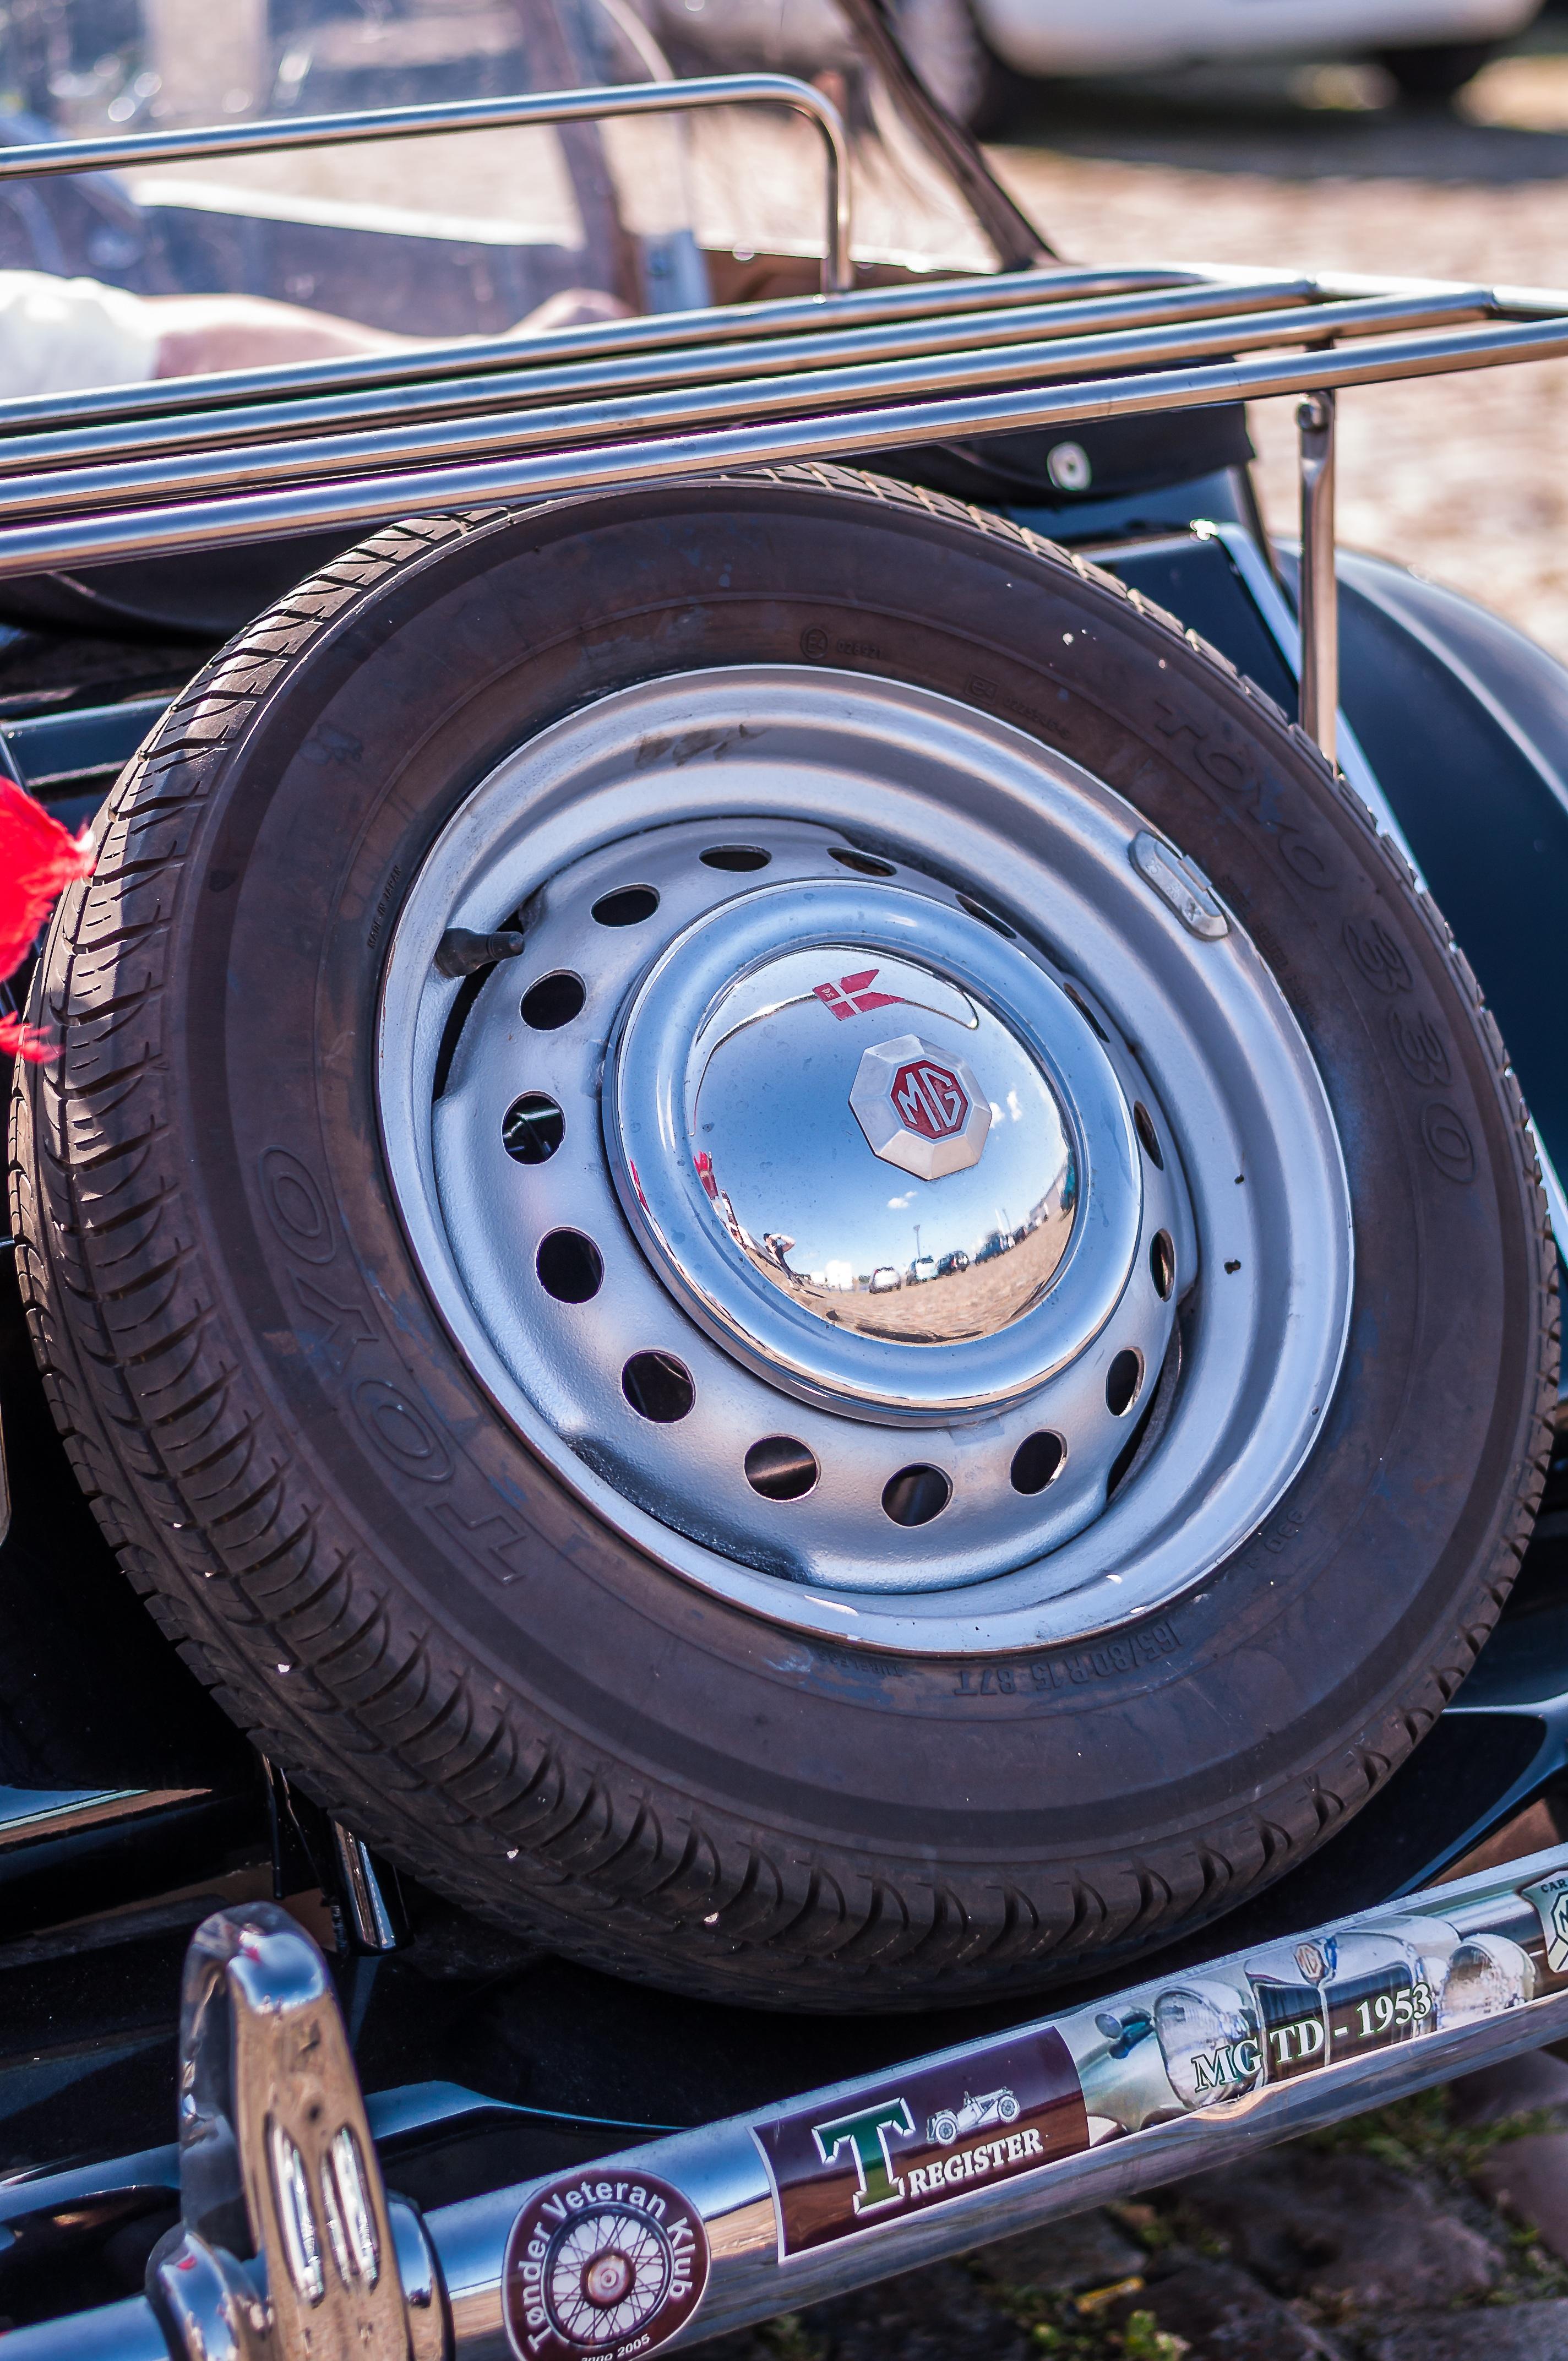 Free Images Retro Vehicle Spoke Nostalgia Close Old Car Sports Vintage Per American Rim Details Denmark Oldtimer Clic